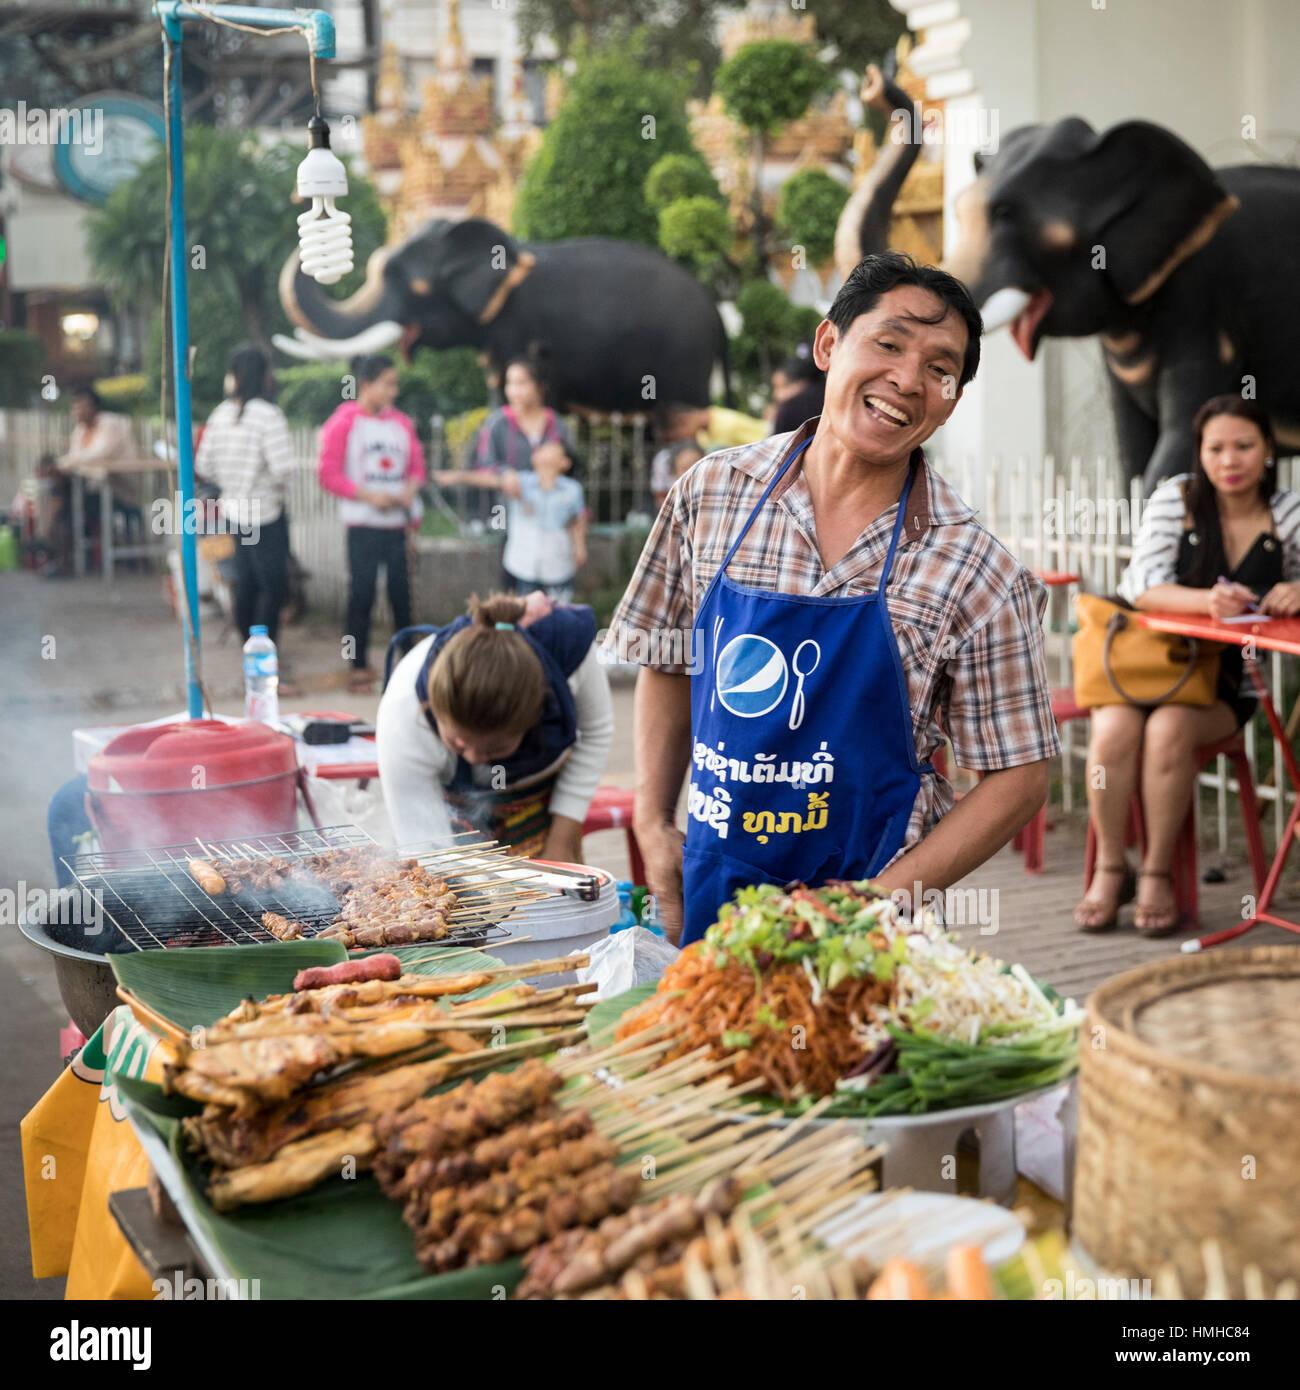 Grilled Meat Vendor at Quai Fa Ngoum near Wat Chan, Vientiane, Laos - Stock Image